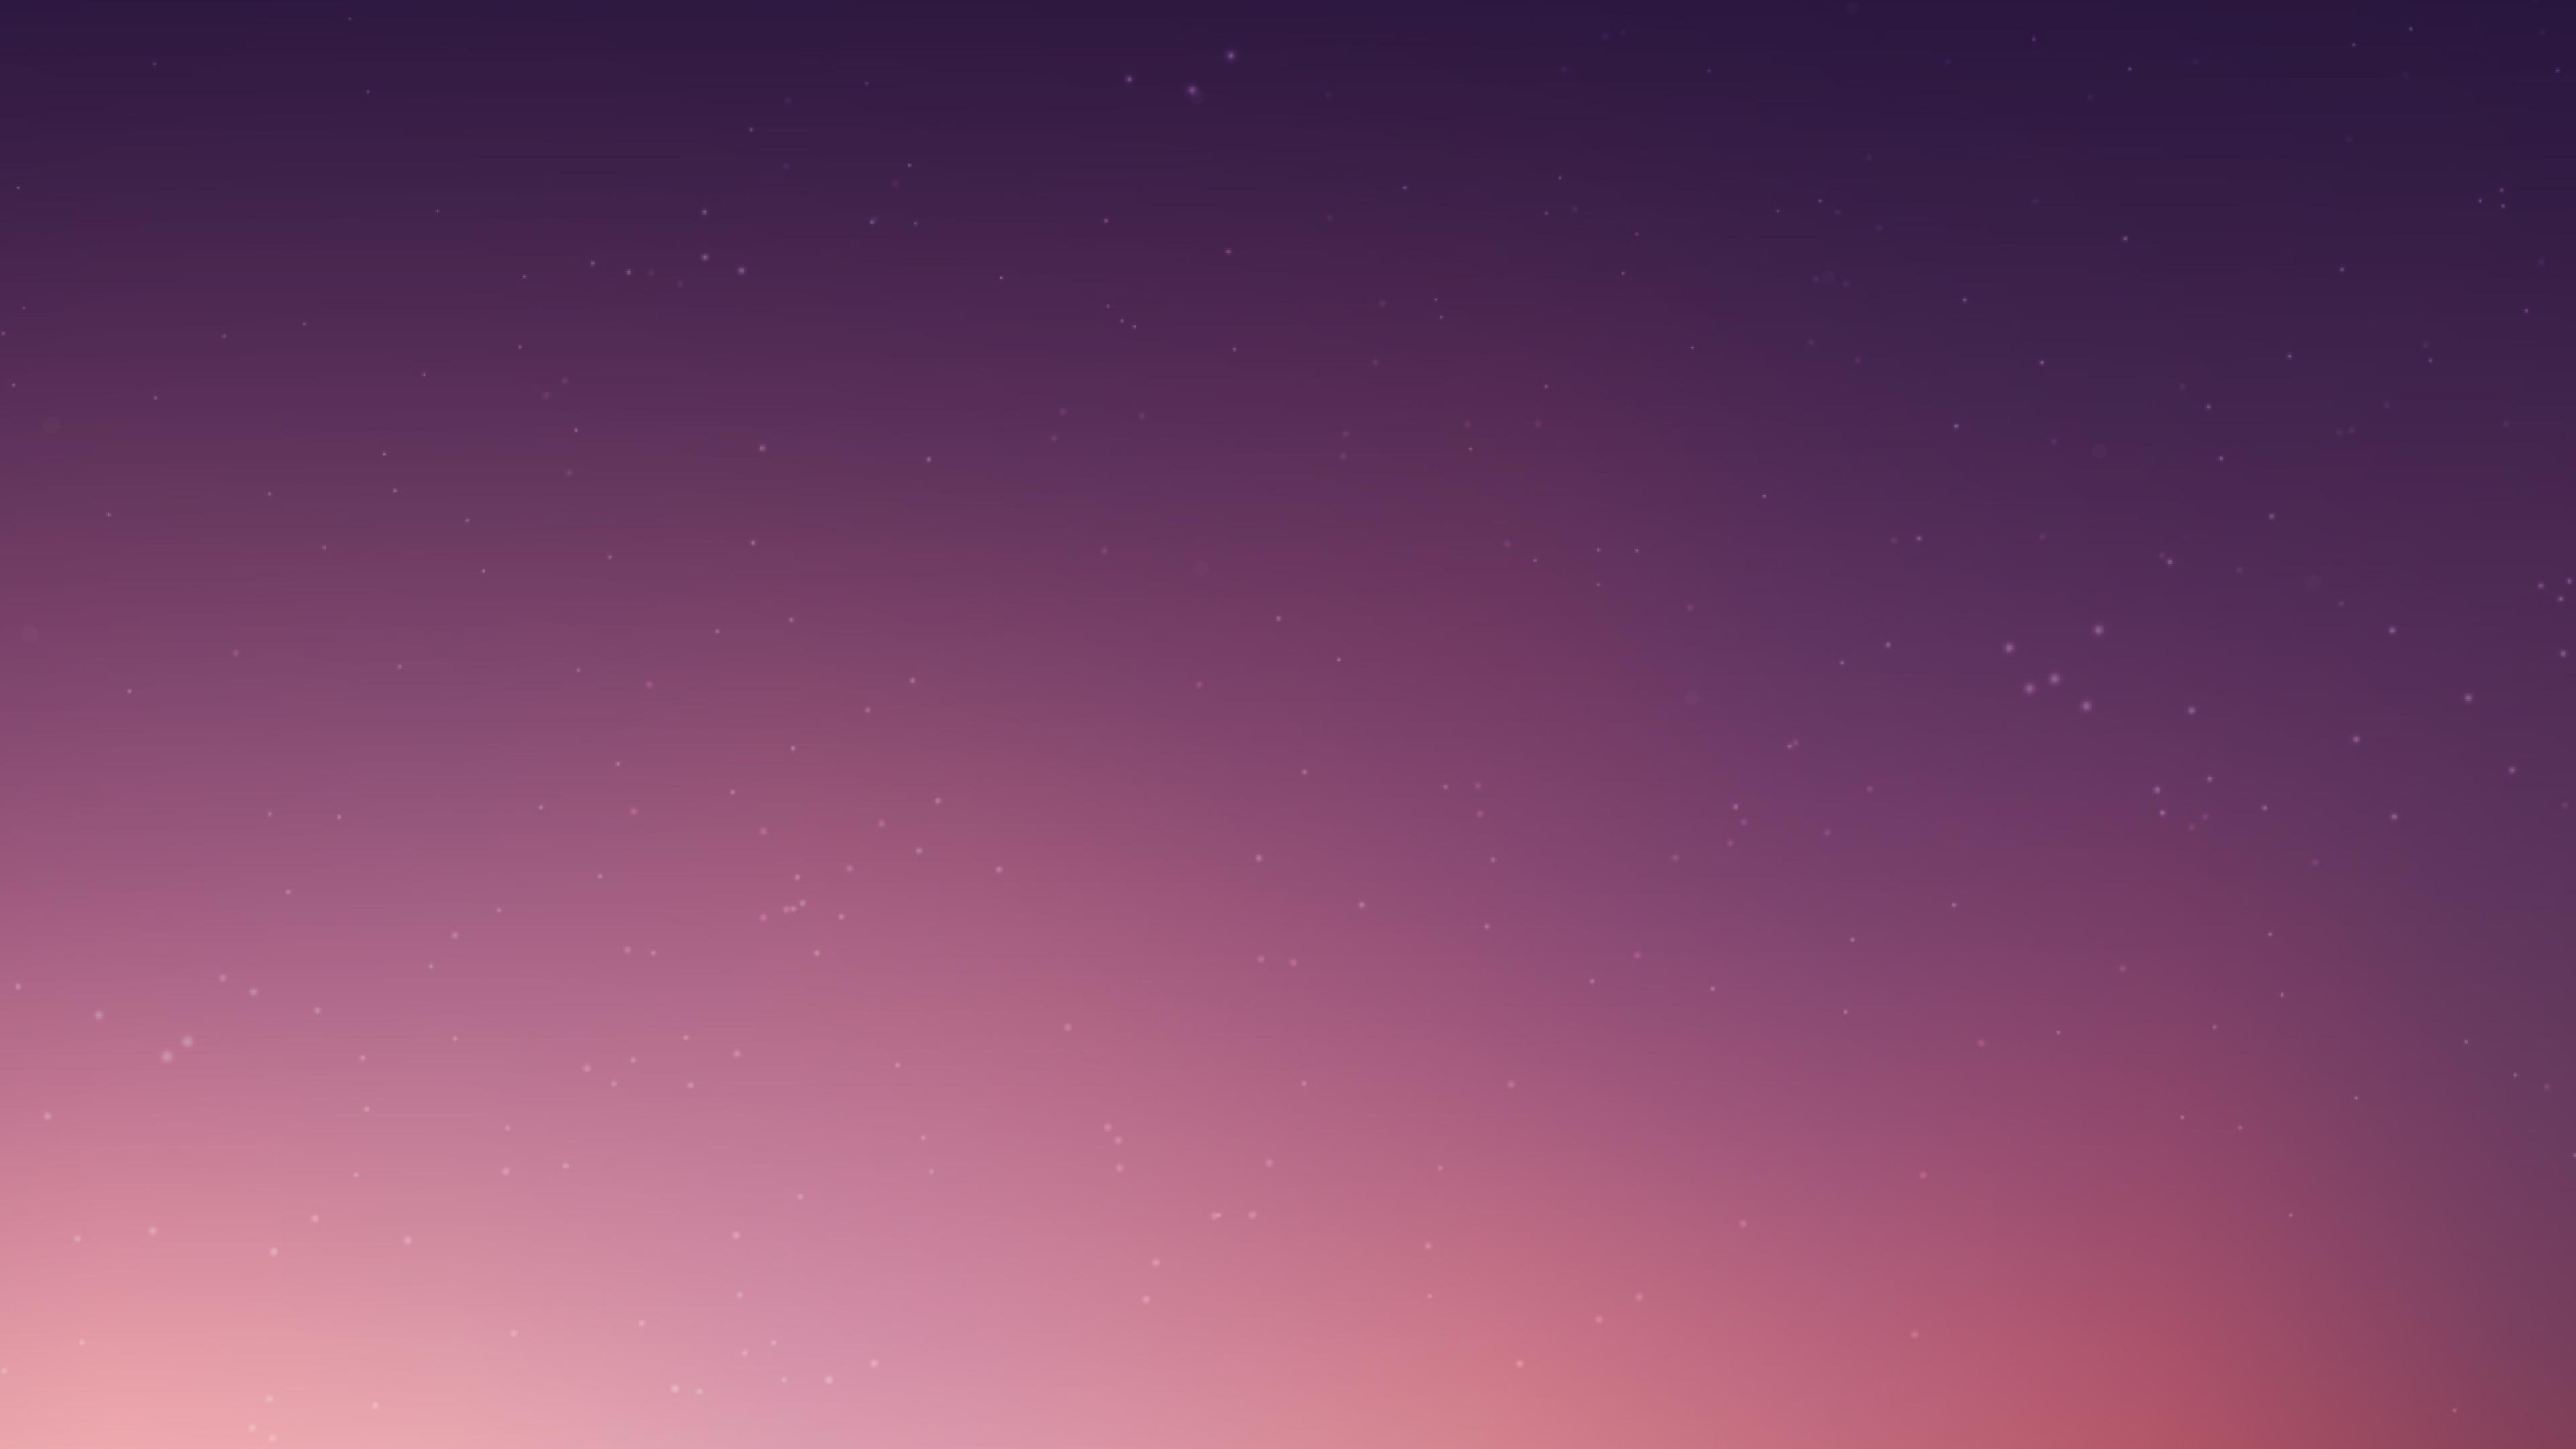 fairwinds_gradient-mesh-original_login_1920x1080@2x